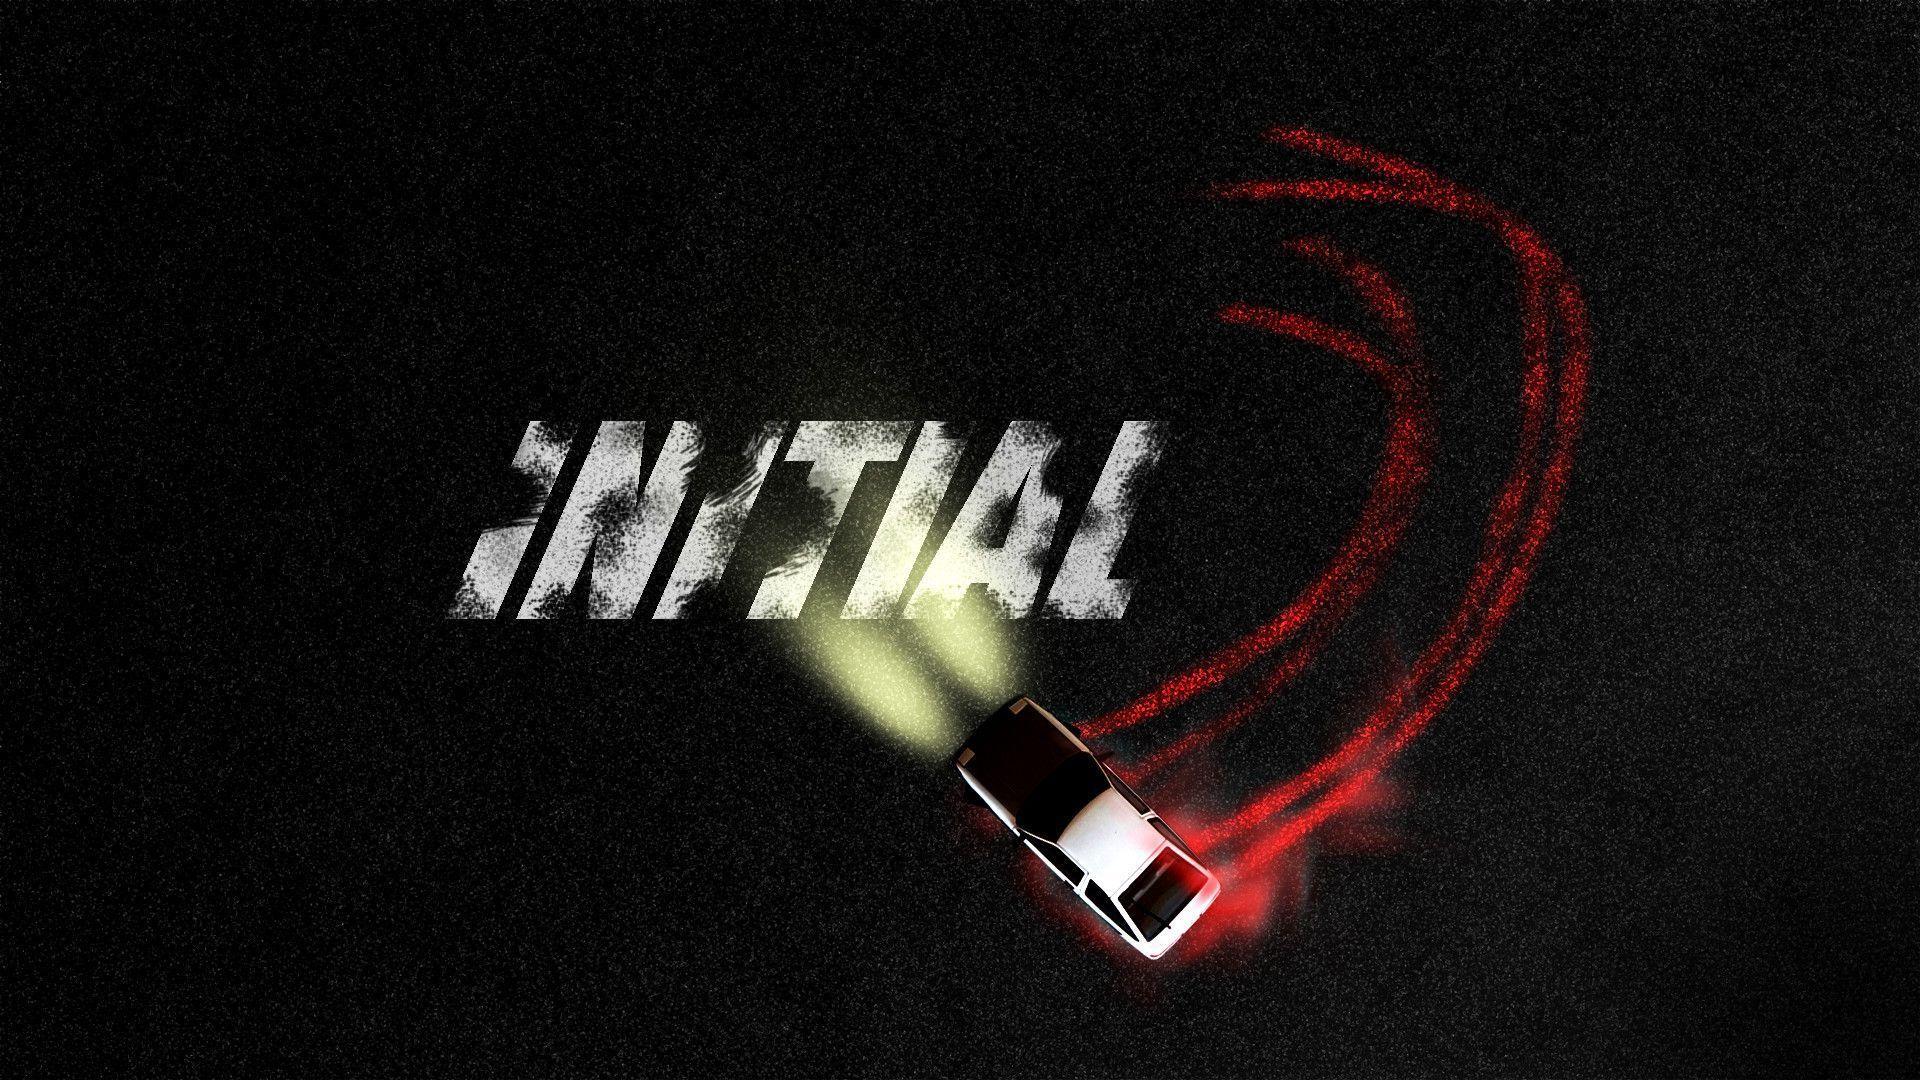 Initial D anime keren tentang drifting 4